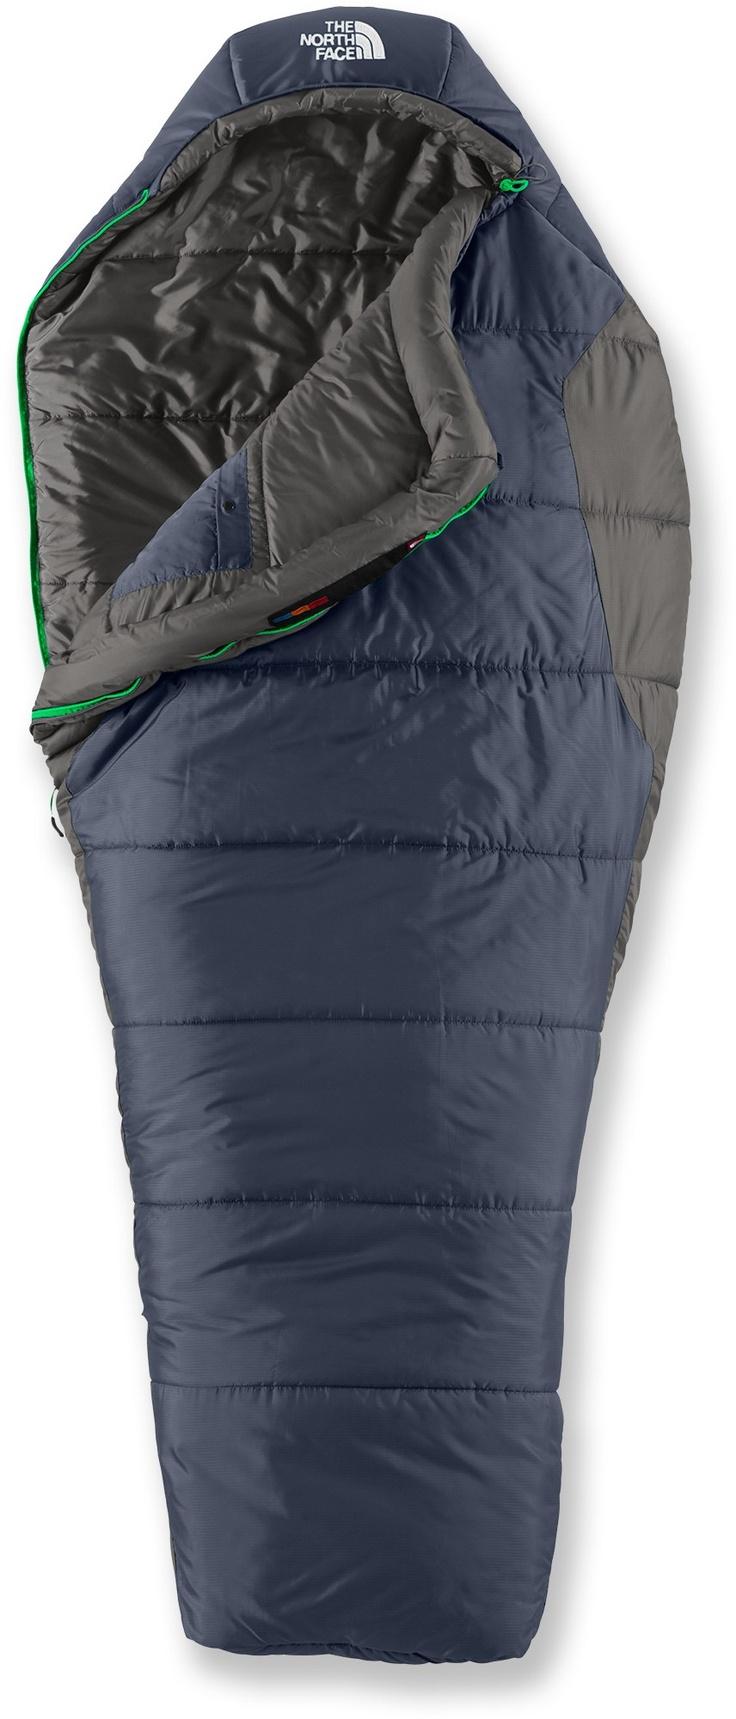 The North Face Aleutian 3S Sleeping Bag